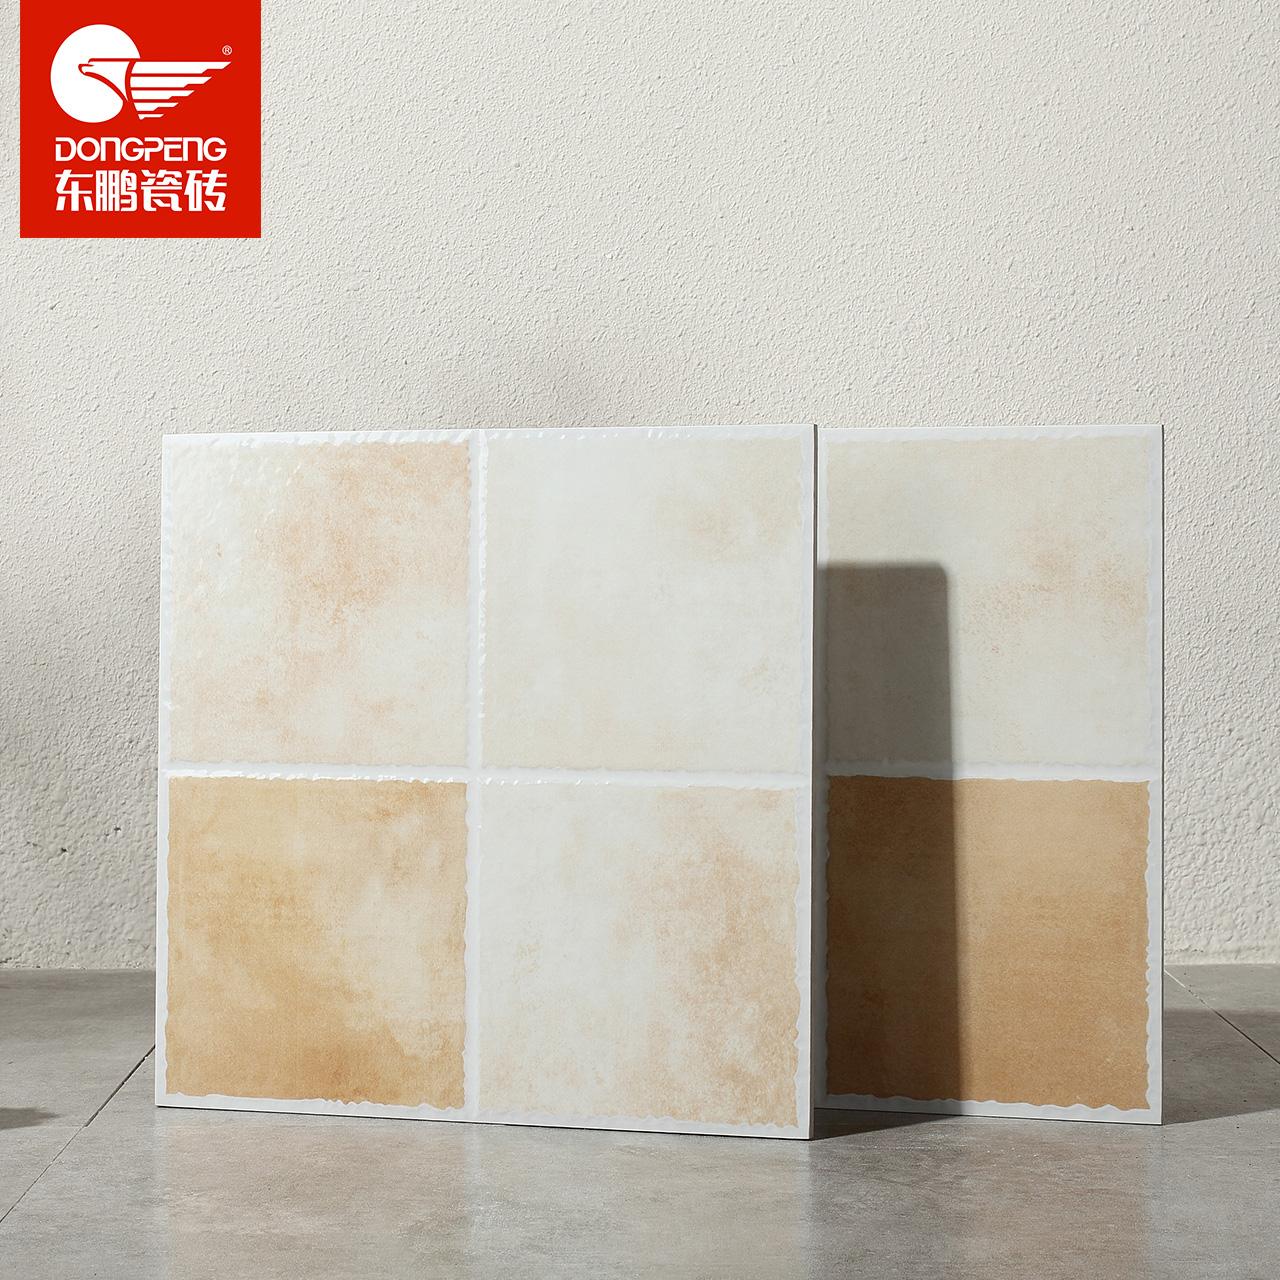 Usd 755 east peng ceramic tile toilet wall tiles glazed tiles lightbox moreview dailygadgetfo Images